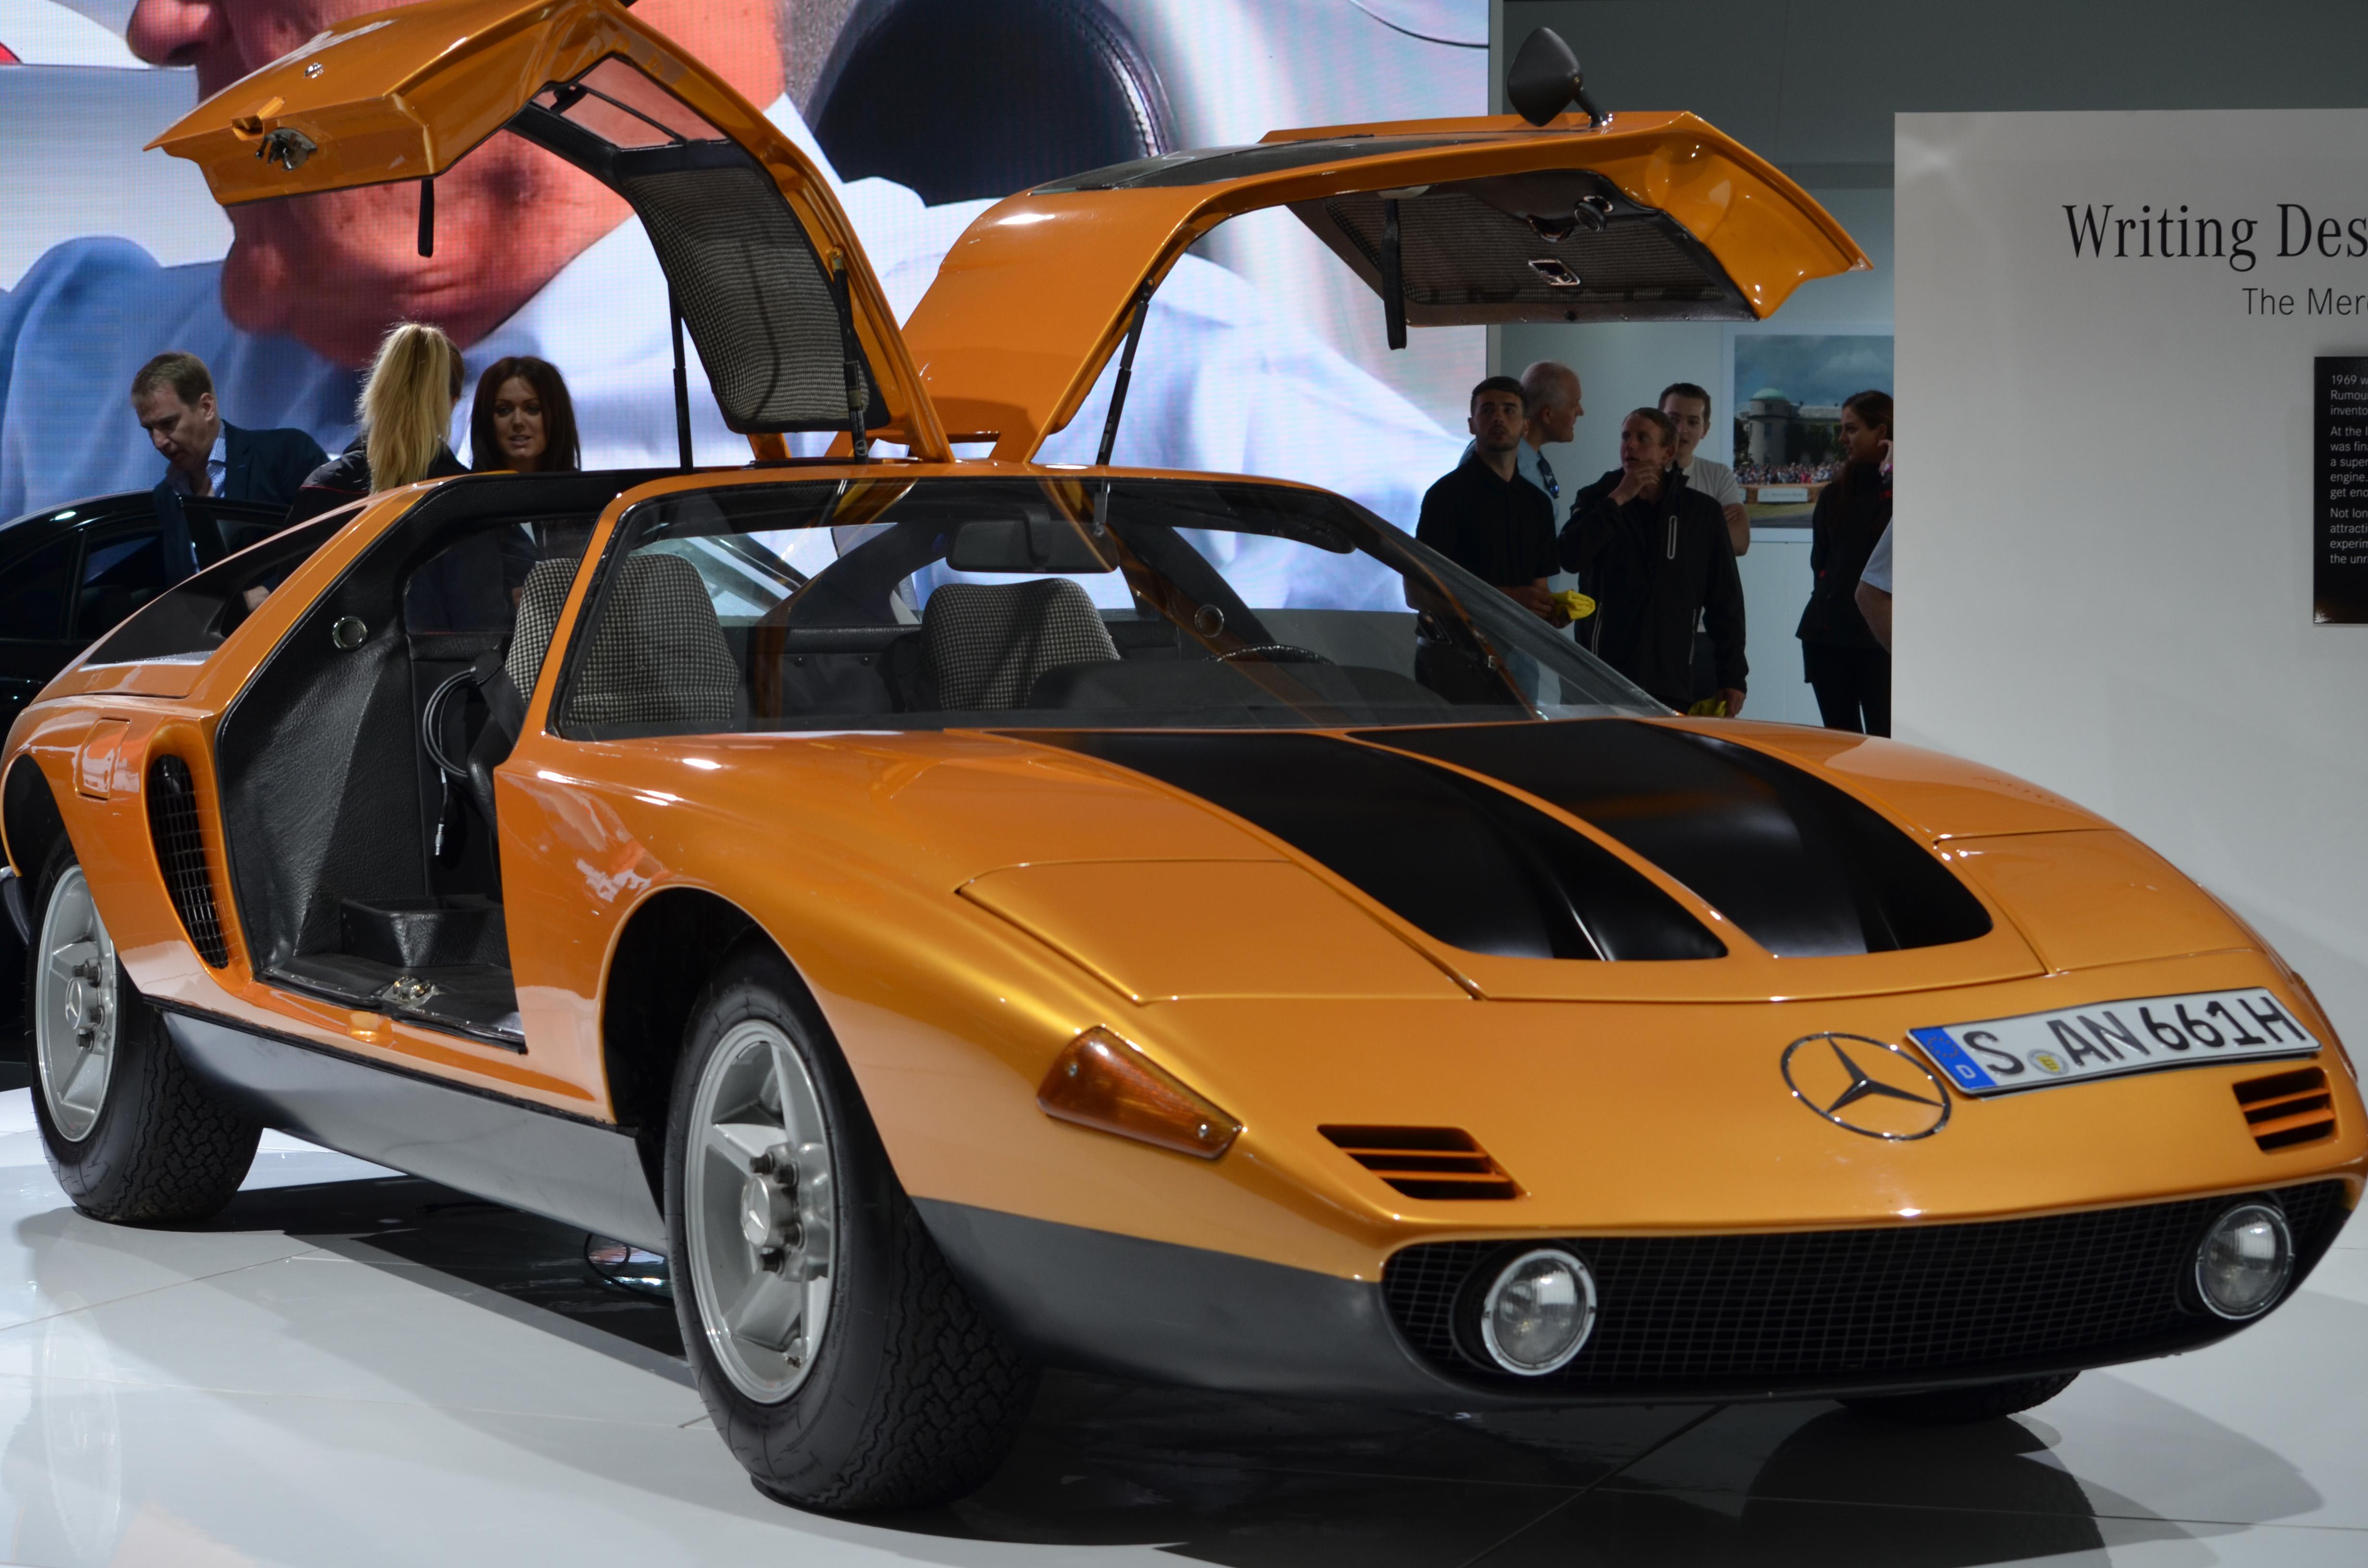 Mercedes_Concept_Car_(19817243989).jpg